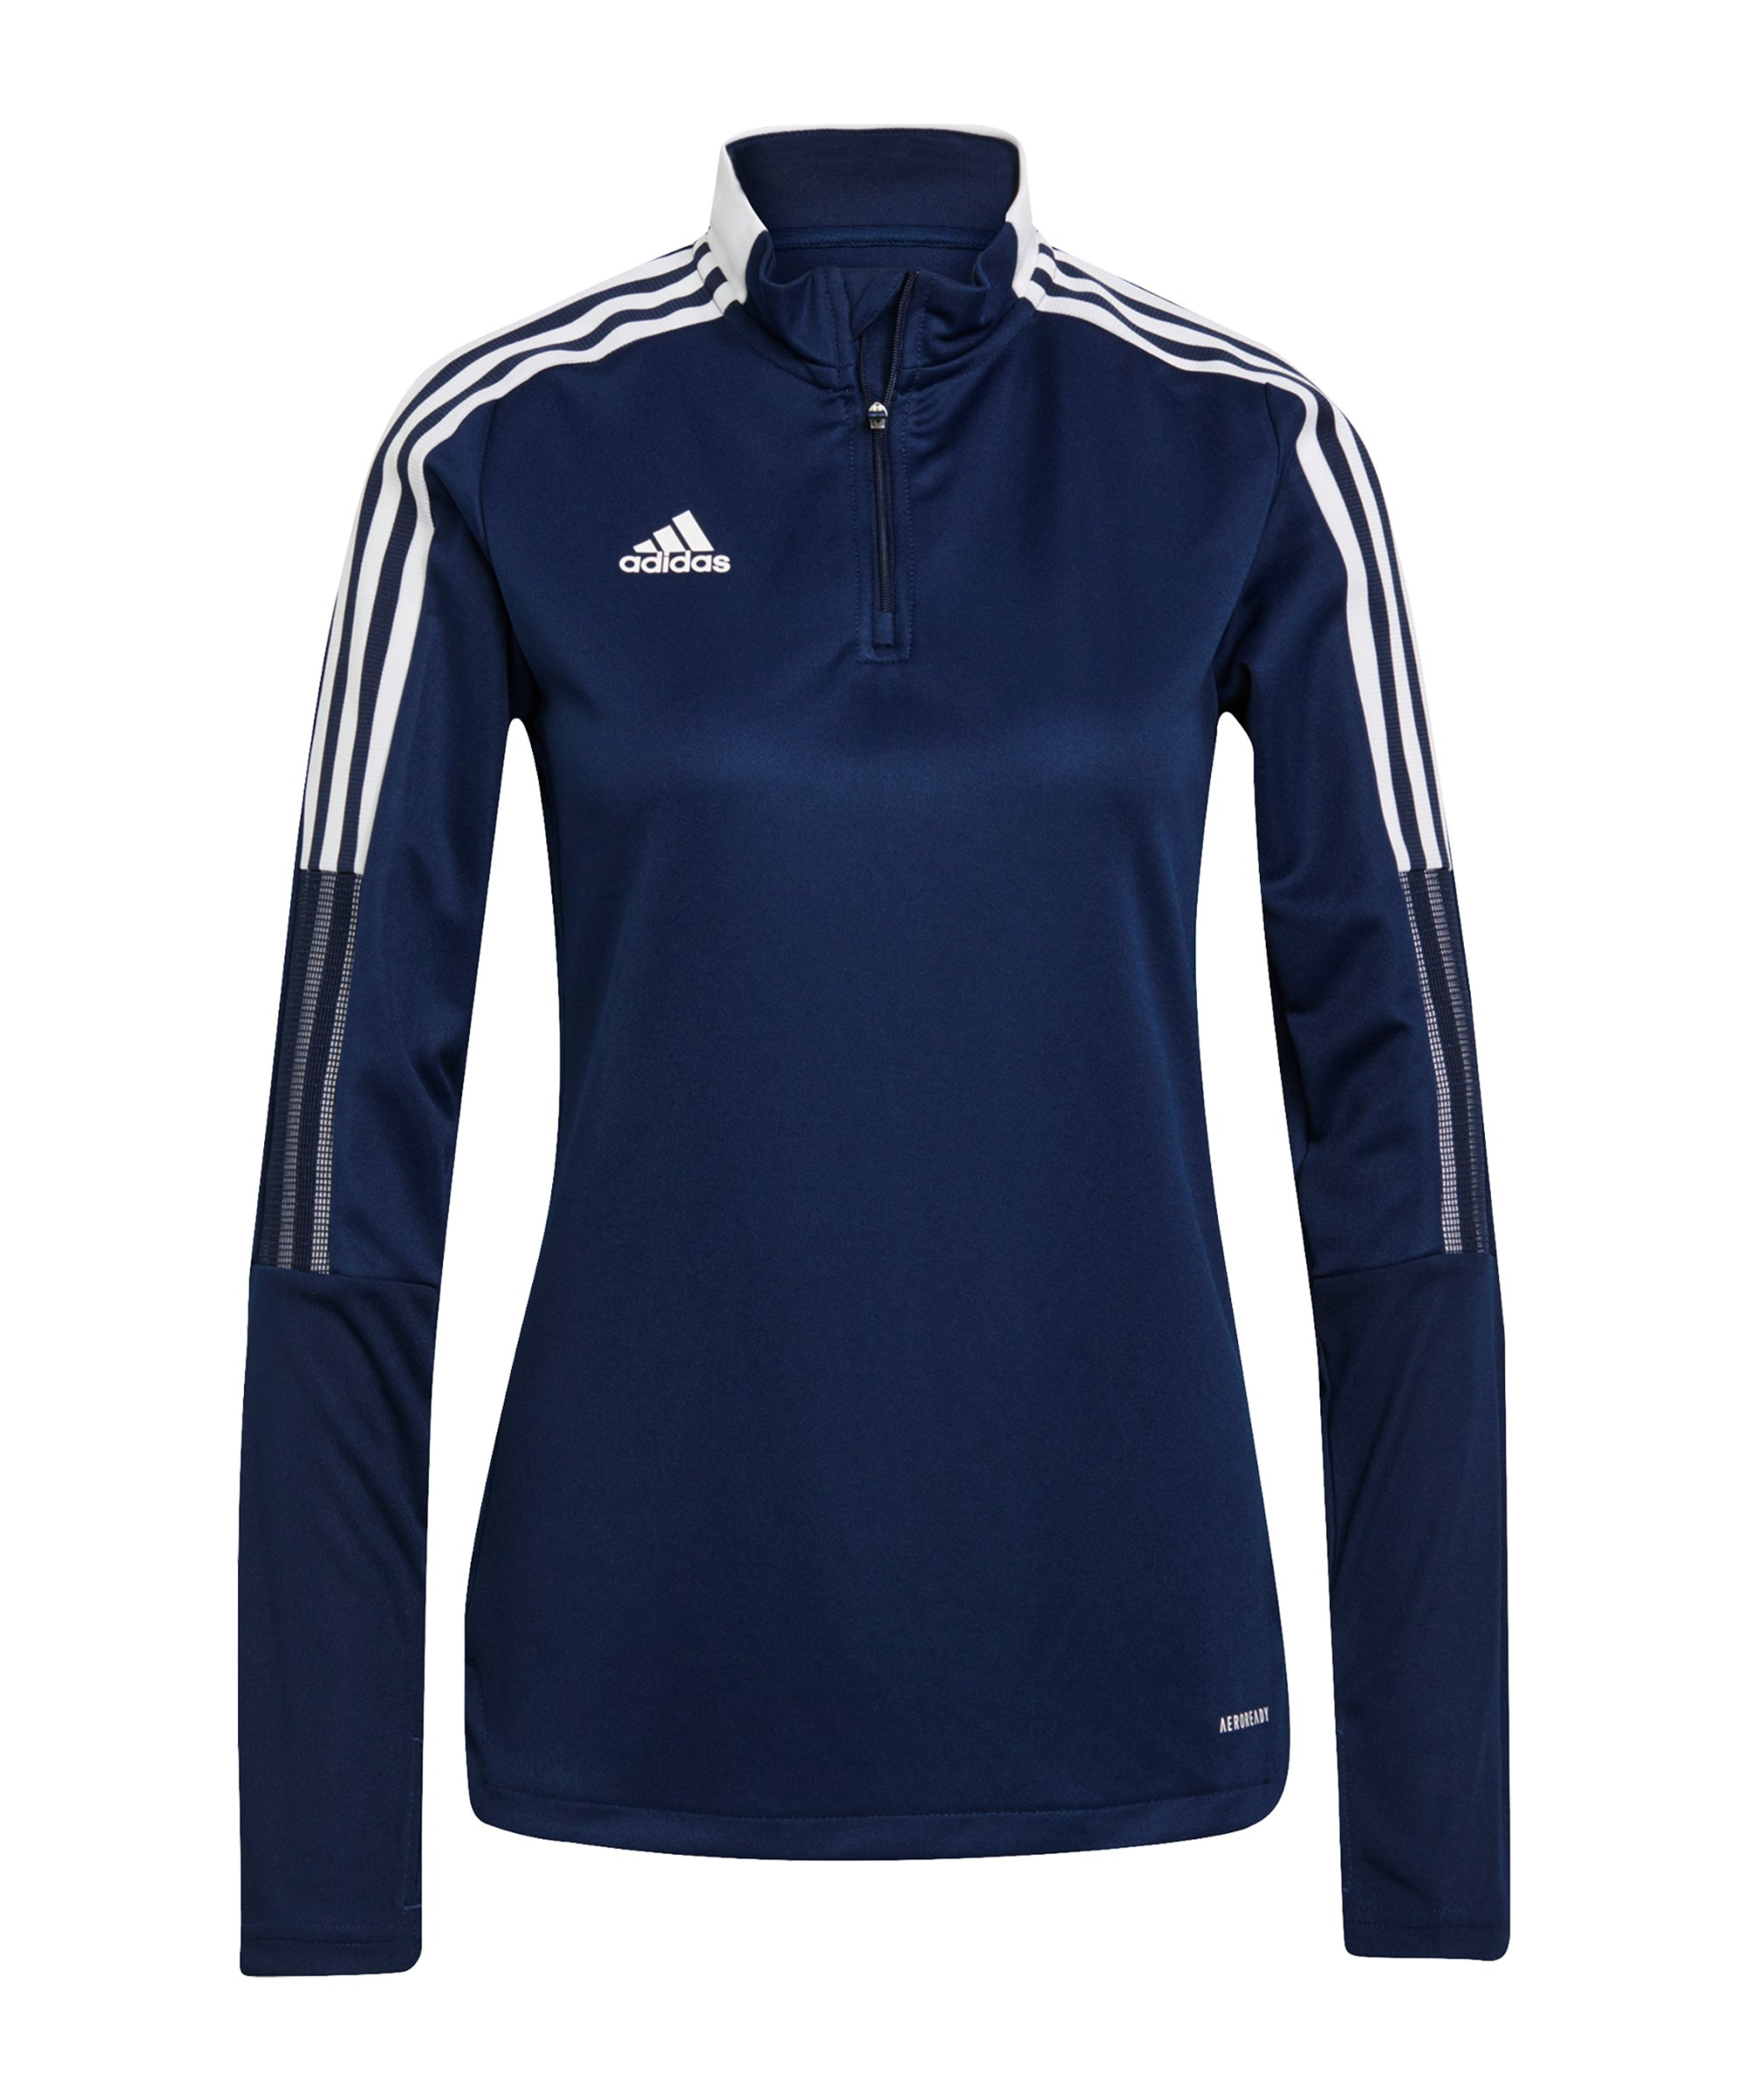 adidas Tiro 21 Trainingstop Damen Dunkelblau - blau